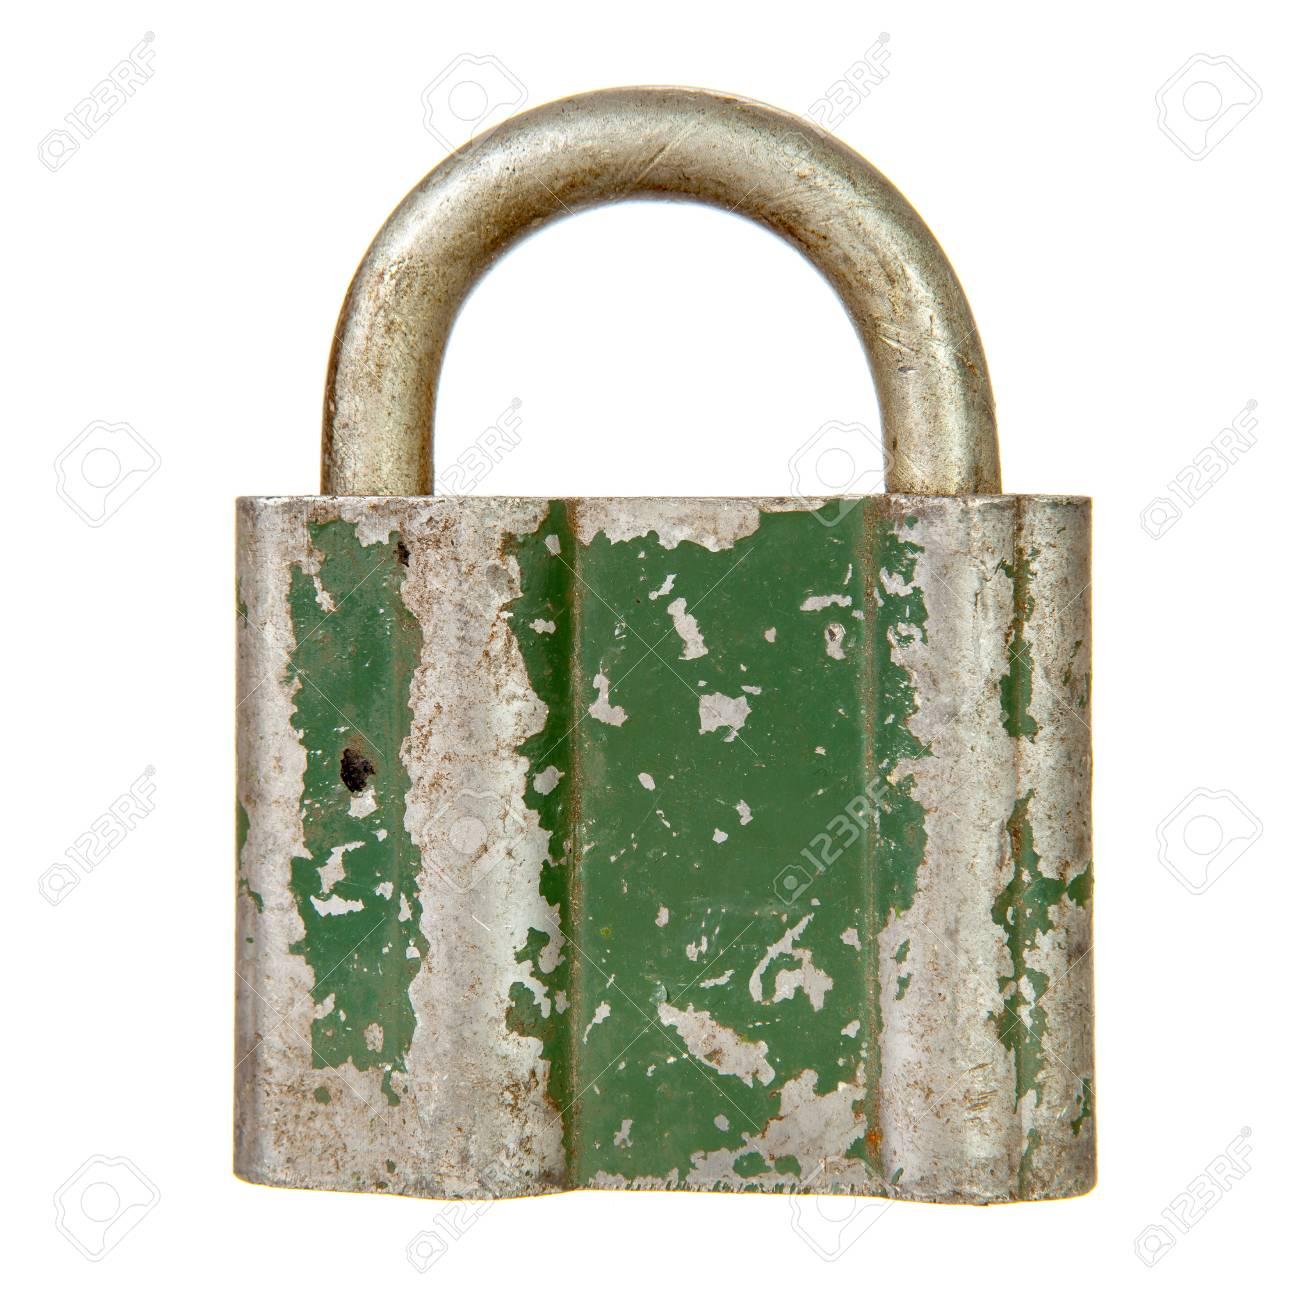 Old padlock isolated over white background Stock Photo - 20413153